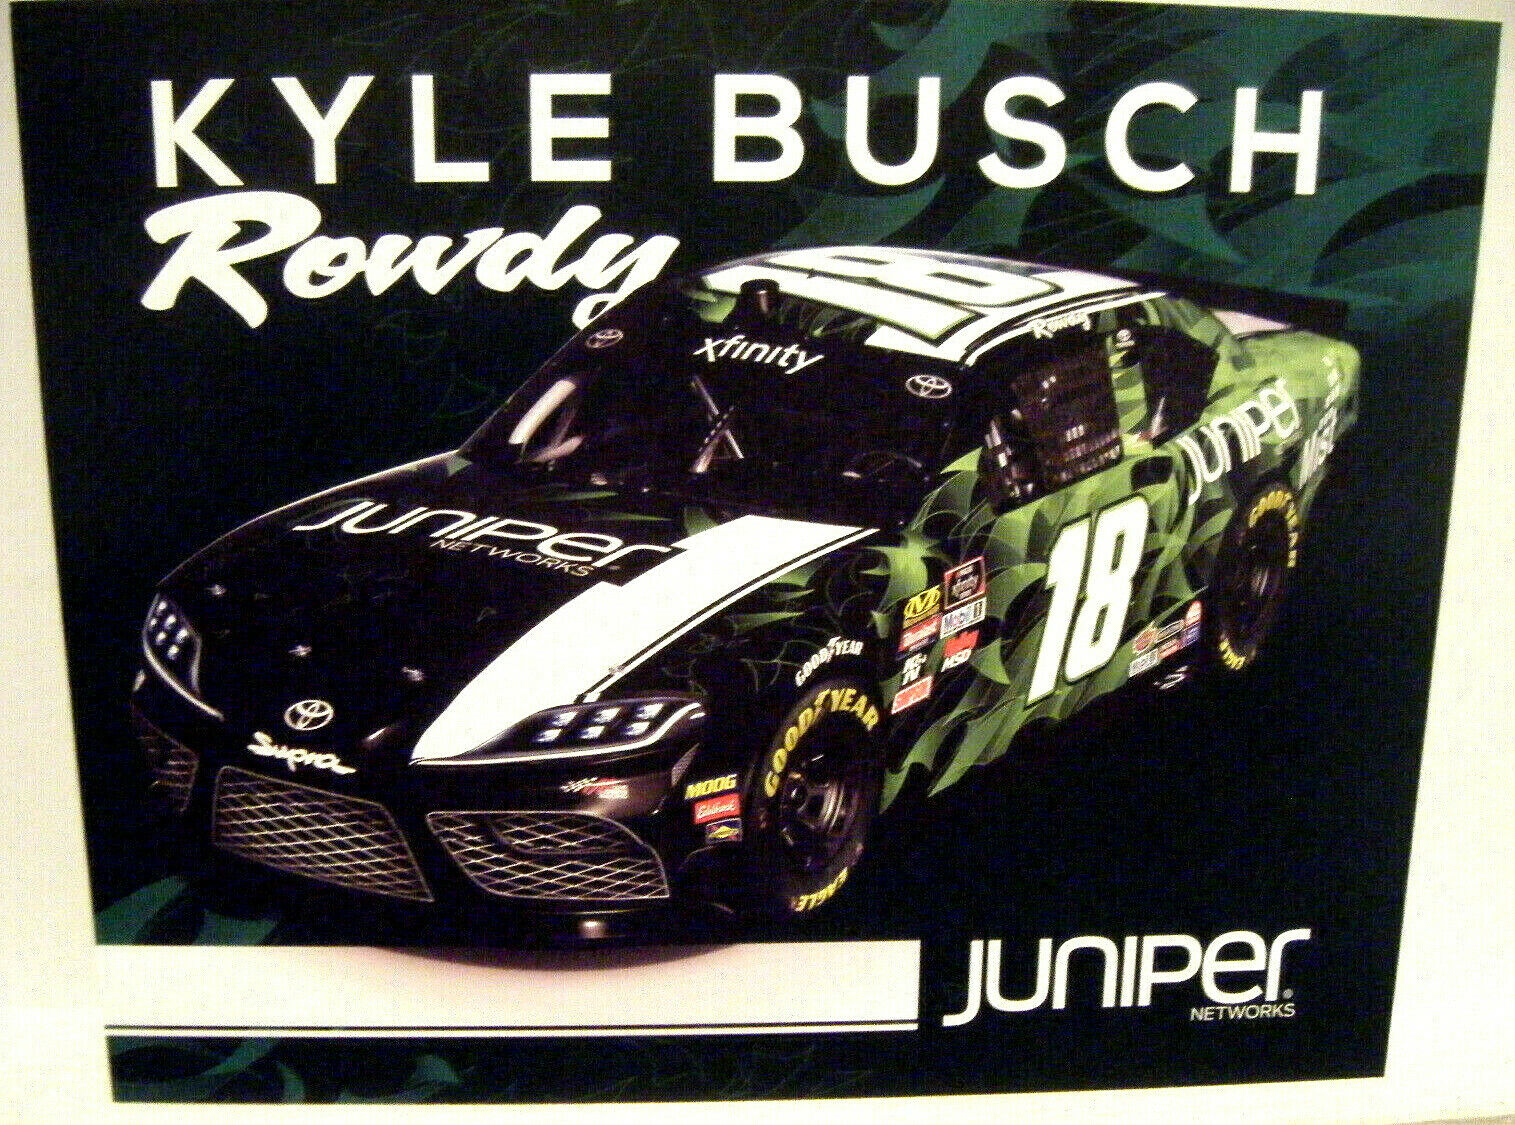 2019 KYLE ROWDY BUSCH JUPITER 18 JGR XFINITY NASCAR SERIES RACING POSTCARD - $1.75